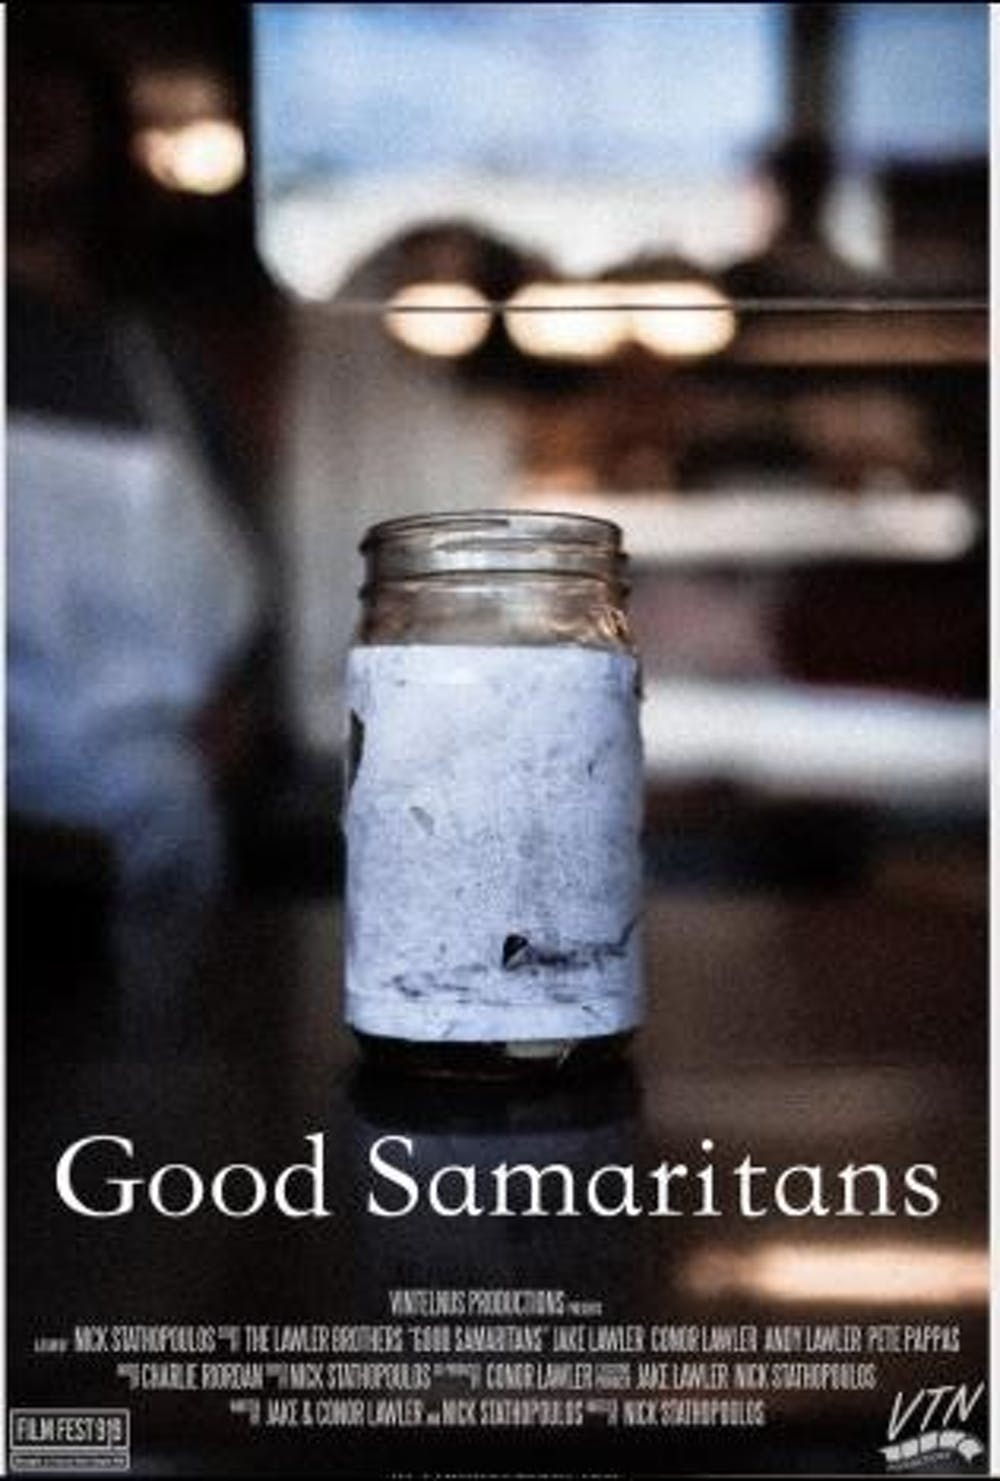 "<p>The poster for UNC alumnus Jake Lawler's ""Good Samaritans,"" one of the 15 films at Film Fest 919. Photo courtesy of Film Fest 919.</p>"